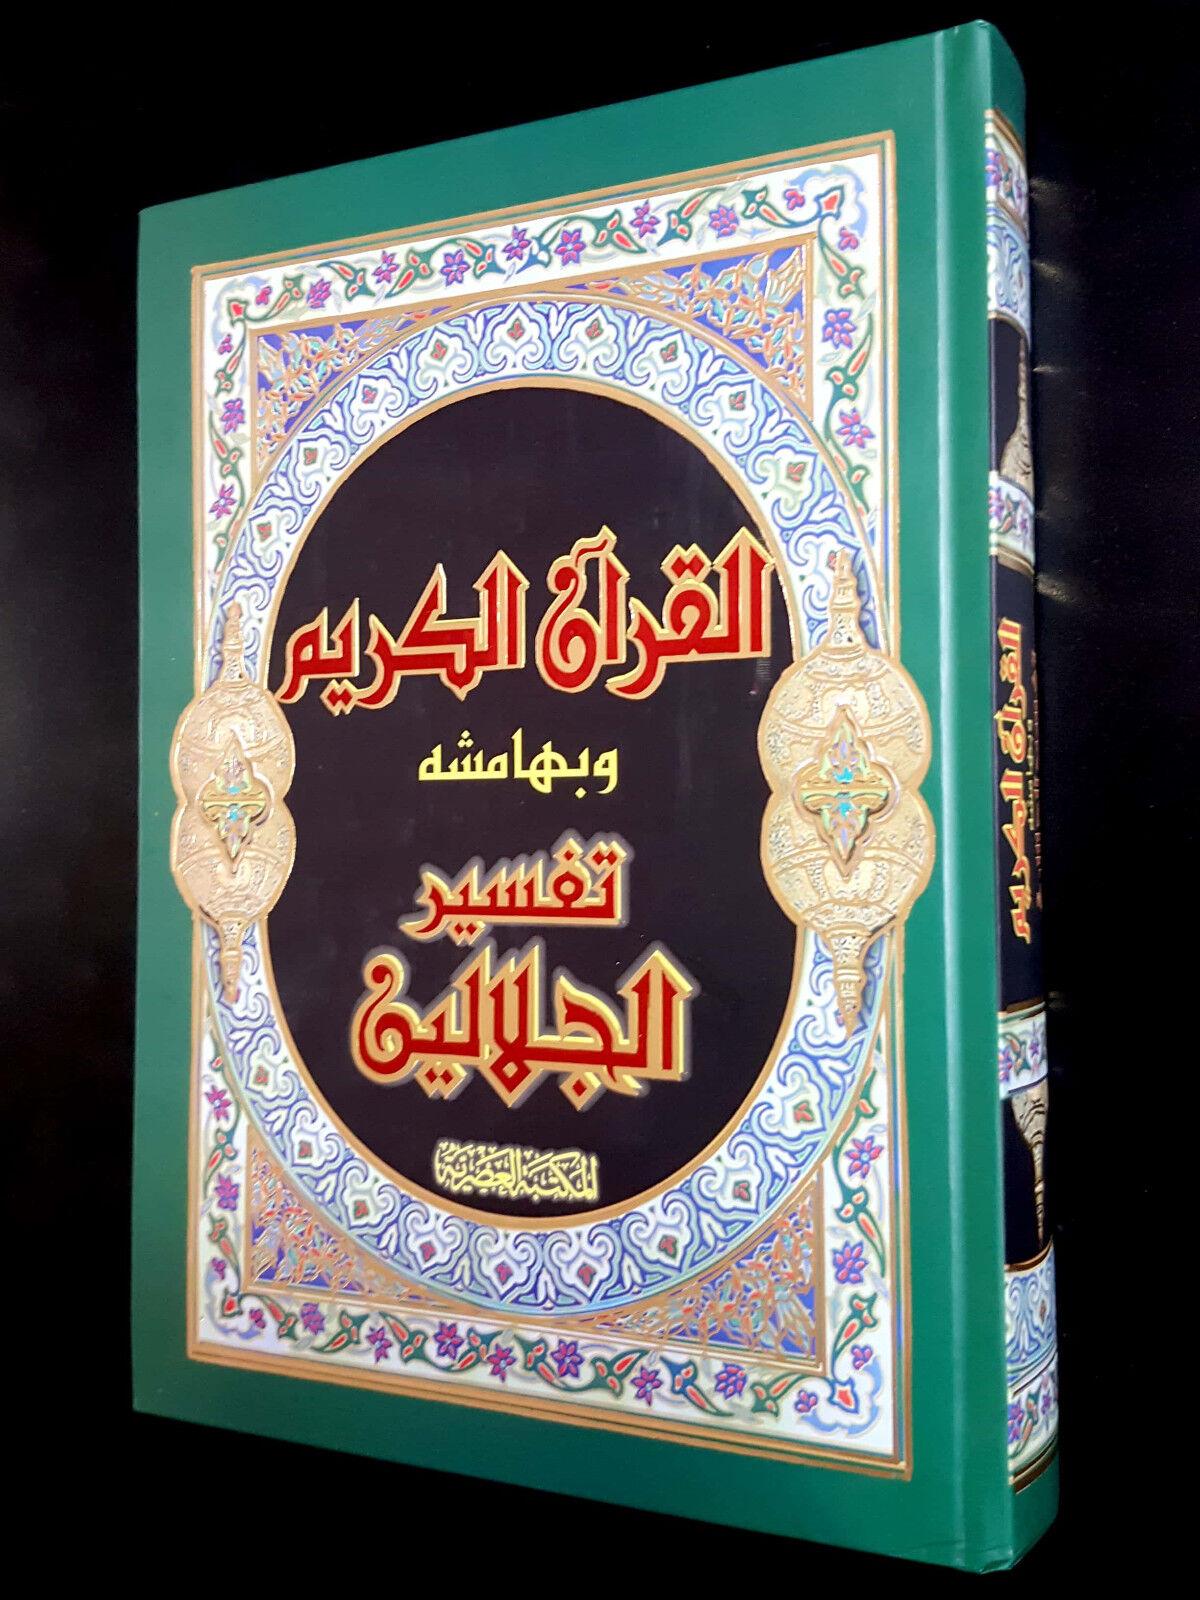 islam abc book Ull time islamic school islamic center after school tahfeez program after school activities for community children summer school/summer camp.